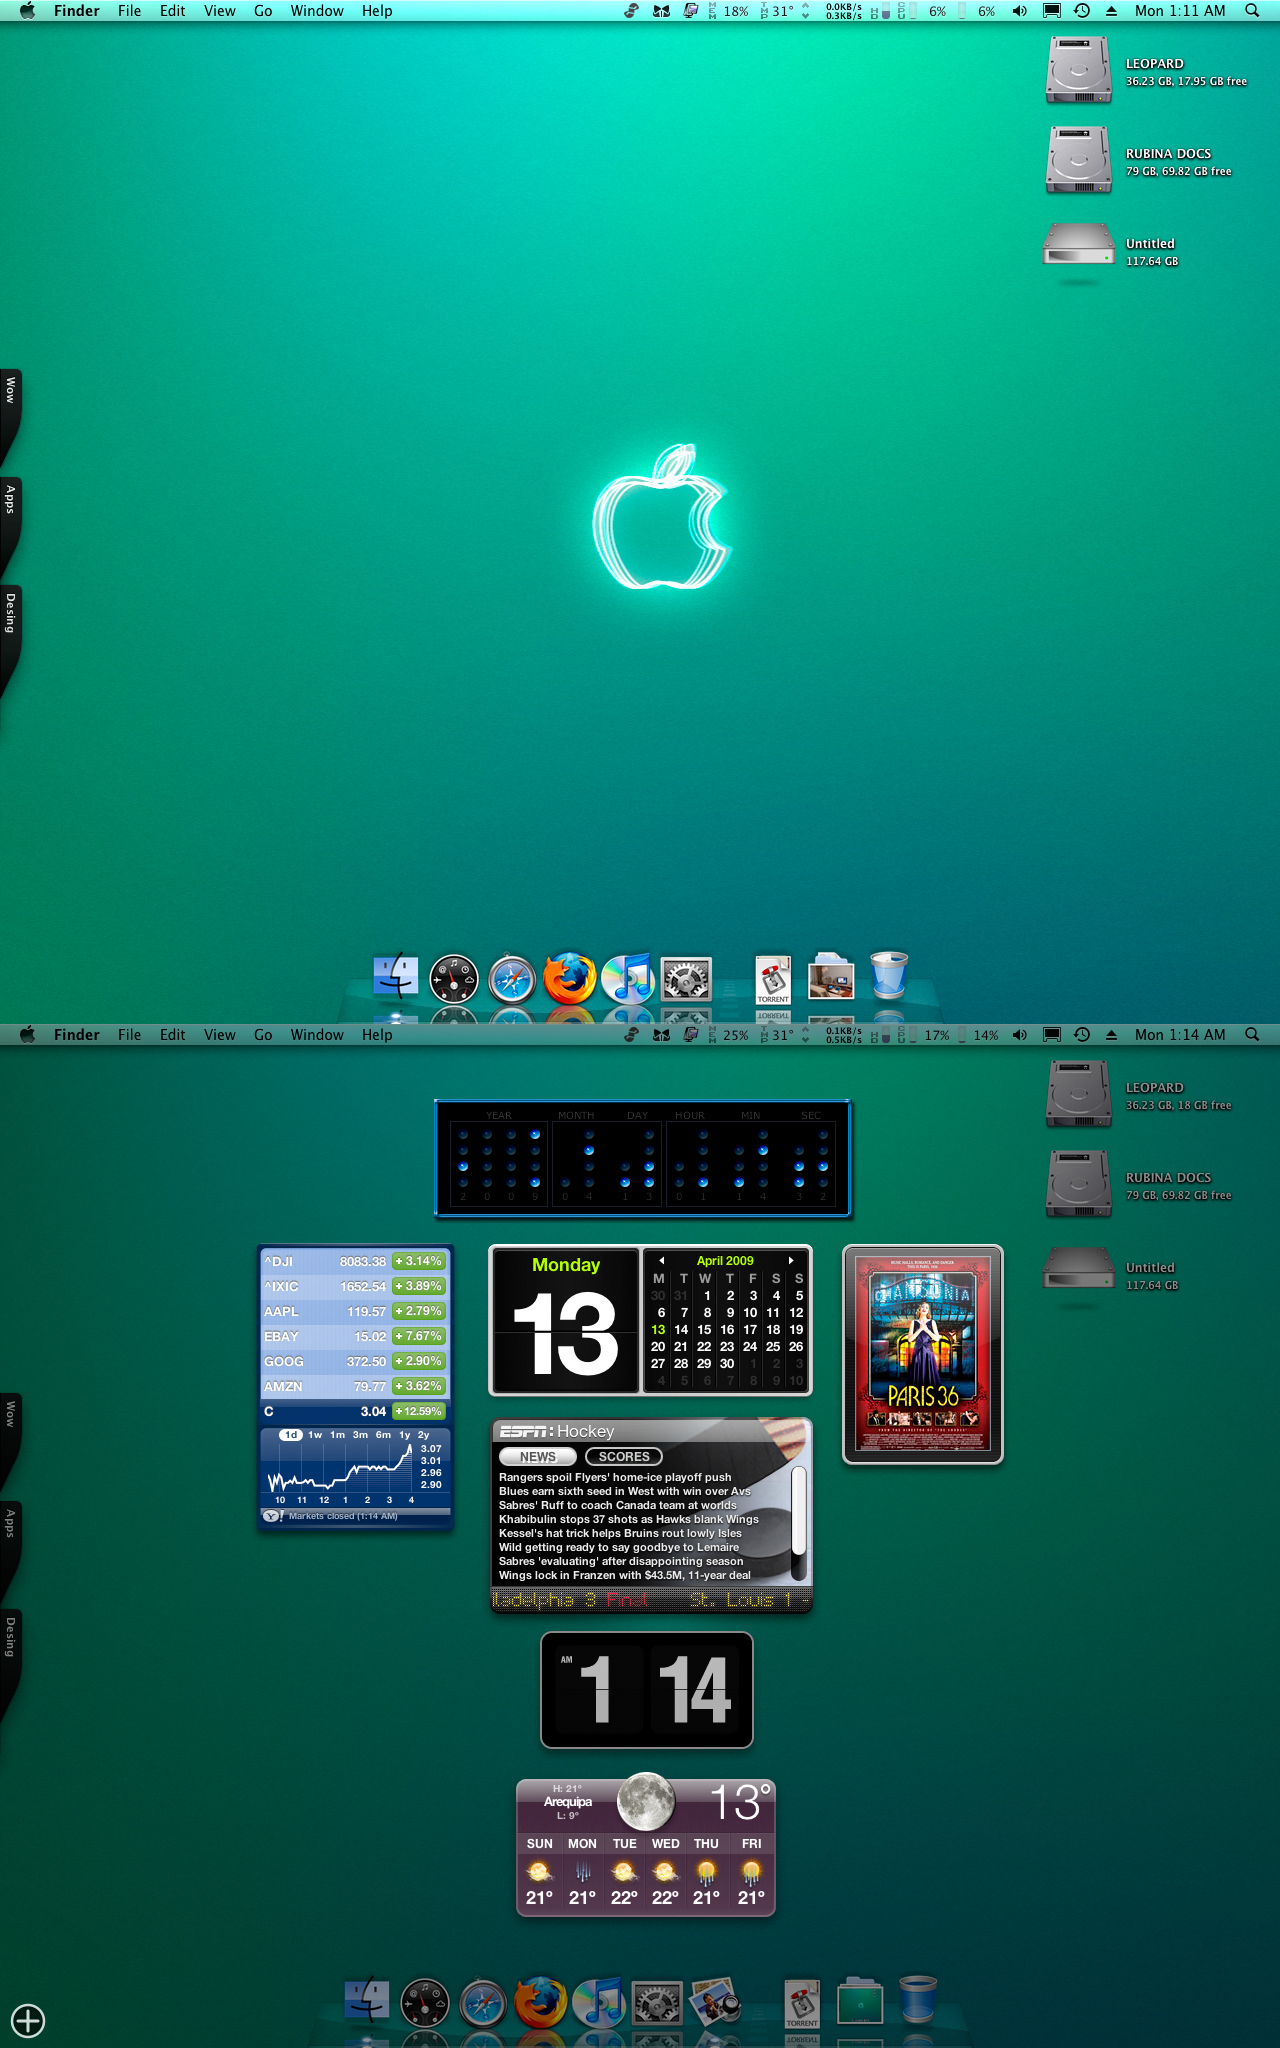 Mac Screen Shot 2 by rubina119